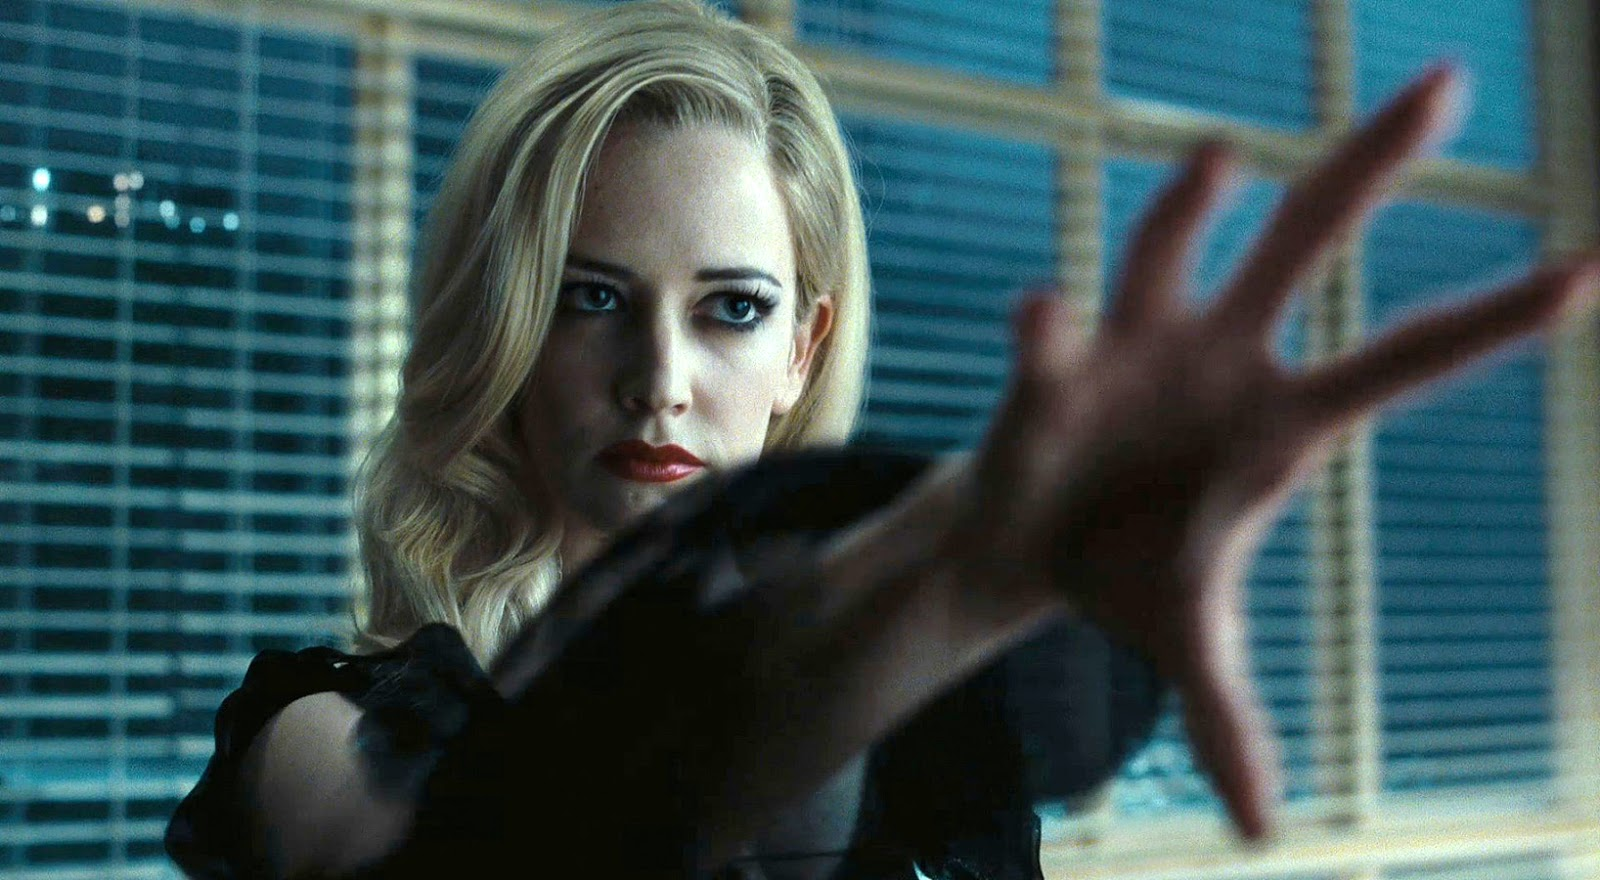 Acidemic - Film: Radium Girls Vs. the 1%: Eva Green in ... Eva Green Movies